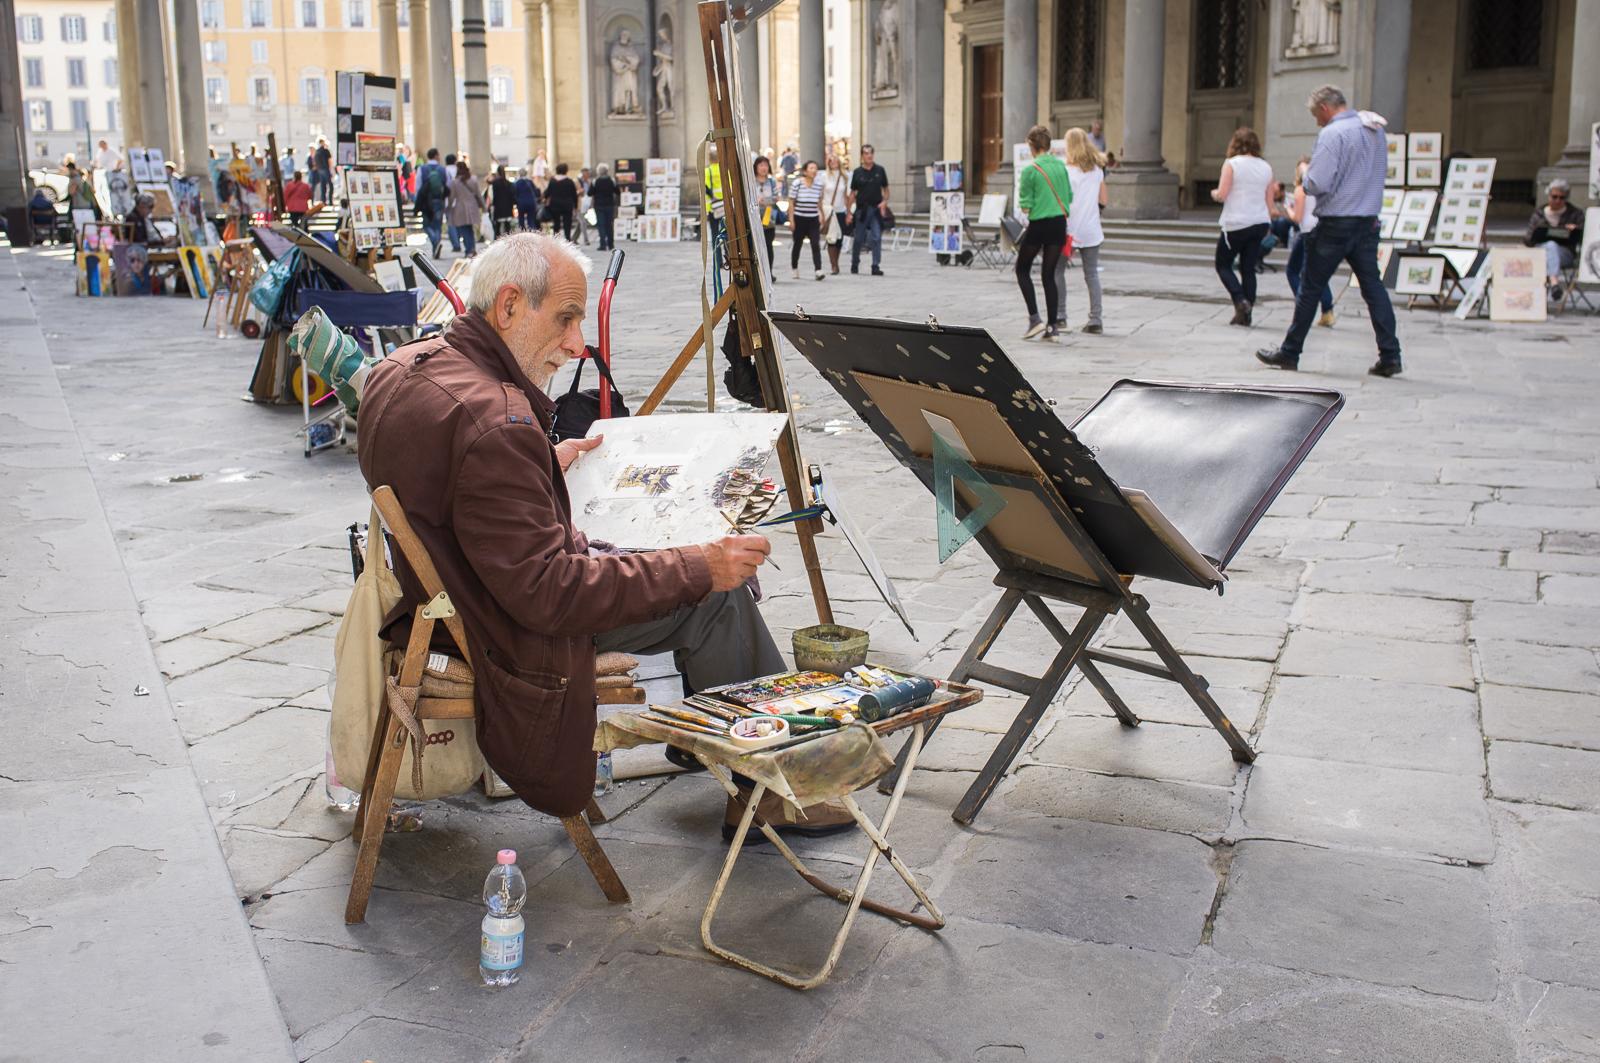 Artist at work near Galleria degli Uffizi